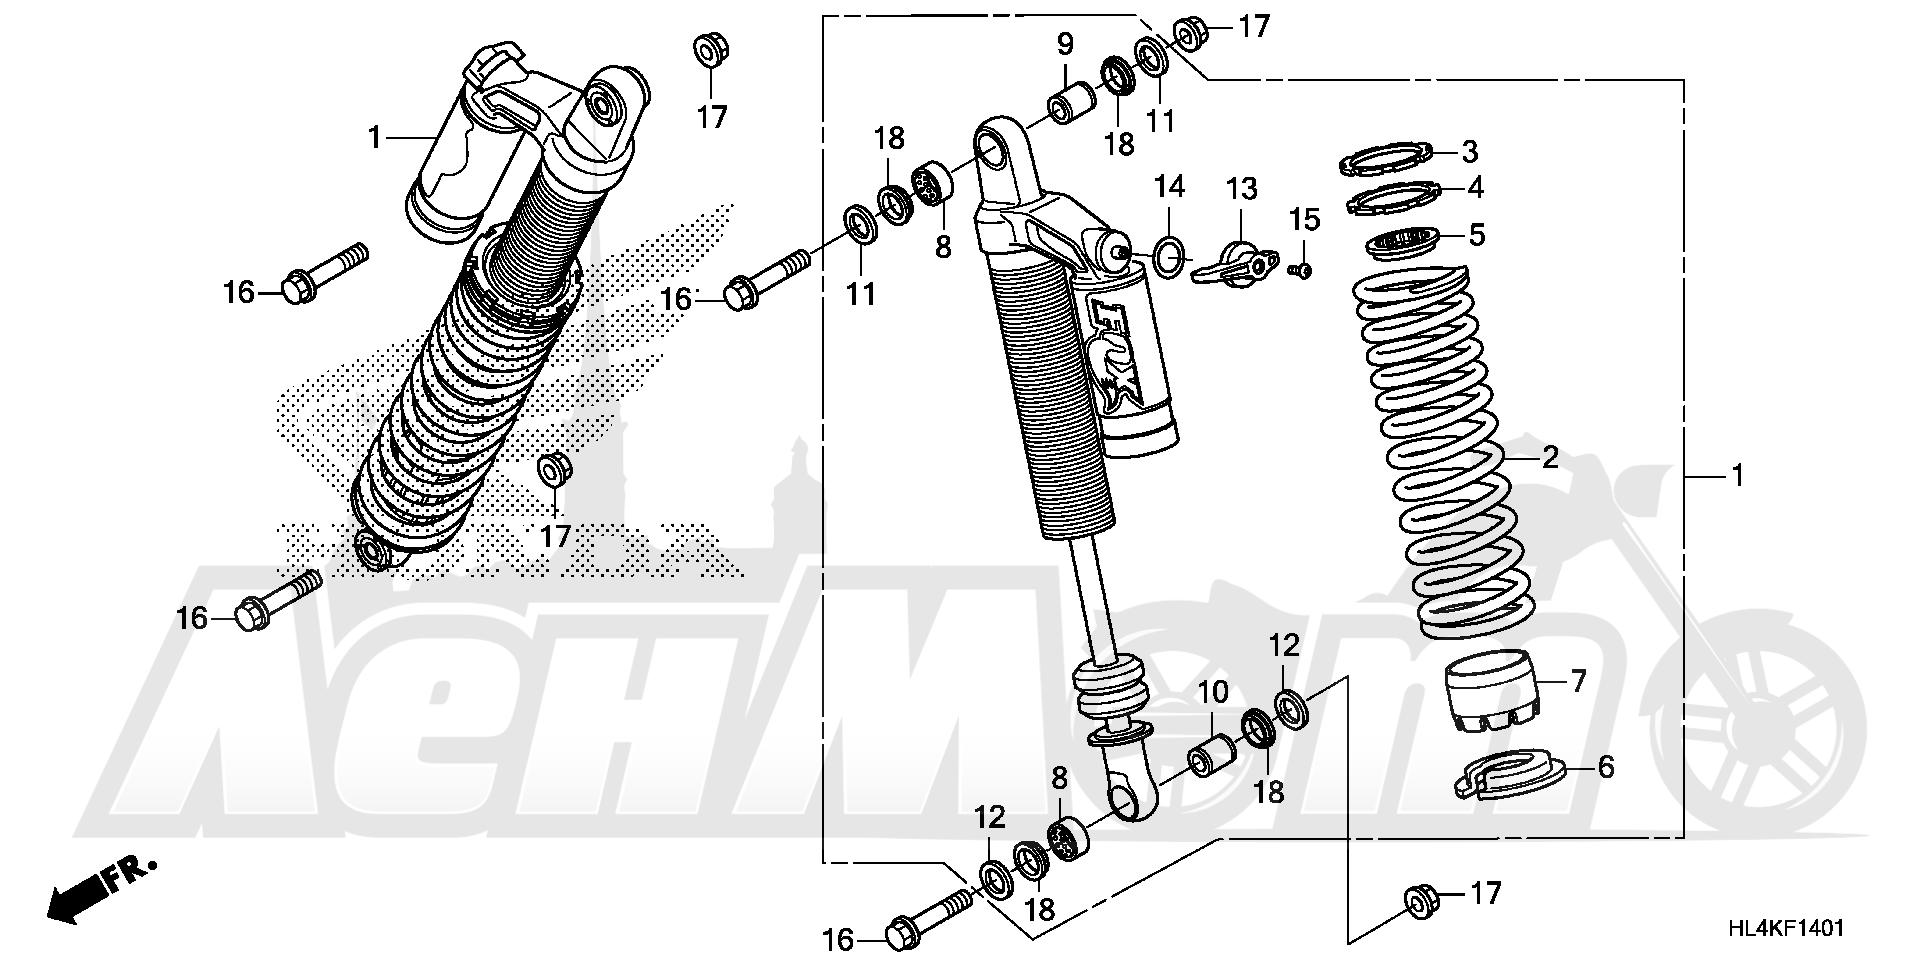 Запчасти для Квадроцикла Honda 2019 SXS1000M5L Раздел: FRONT CUSHION (2) | перед подкладка (2)